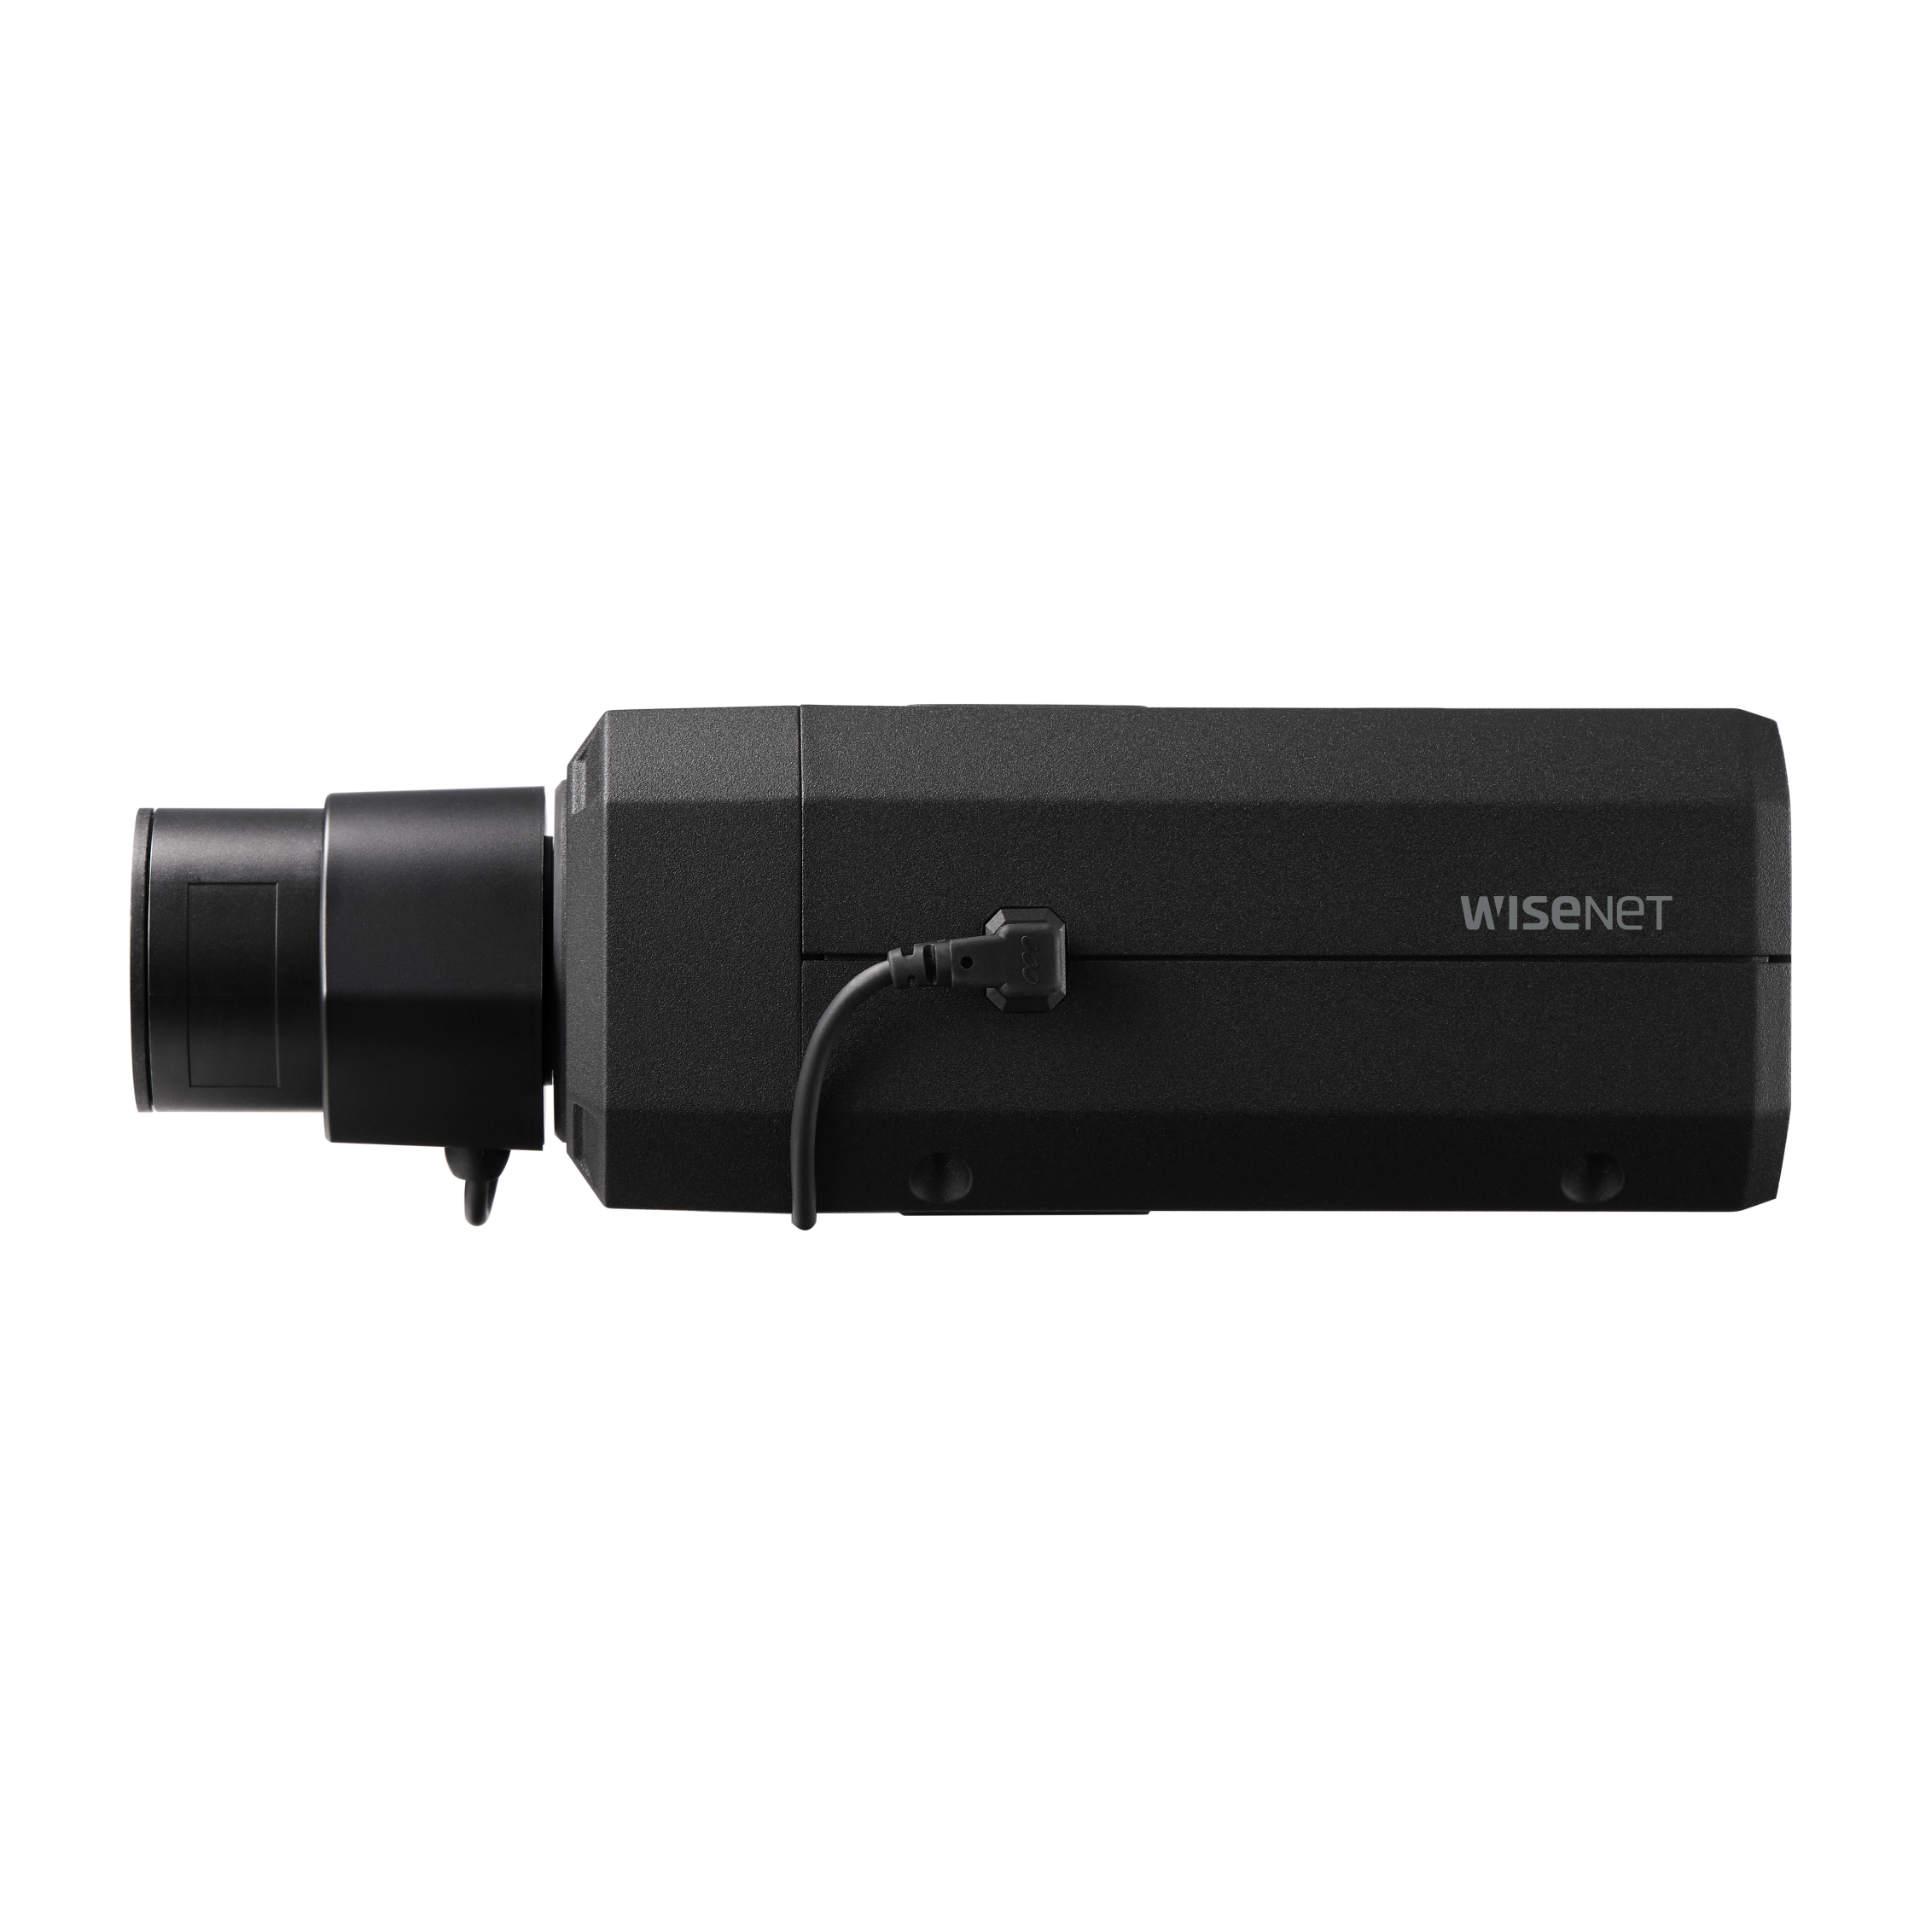 XNB-8002 6MP Network Box Camera